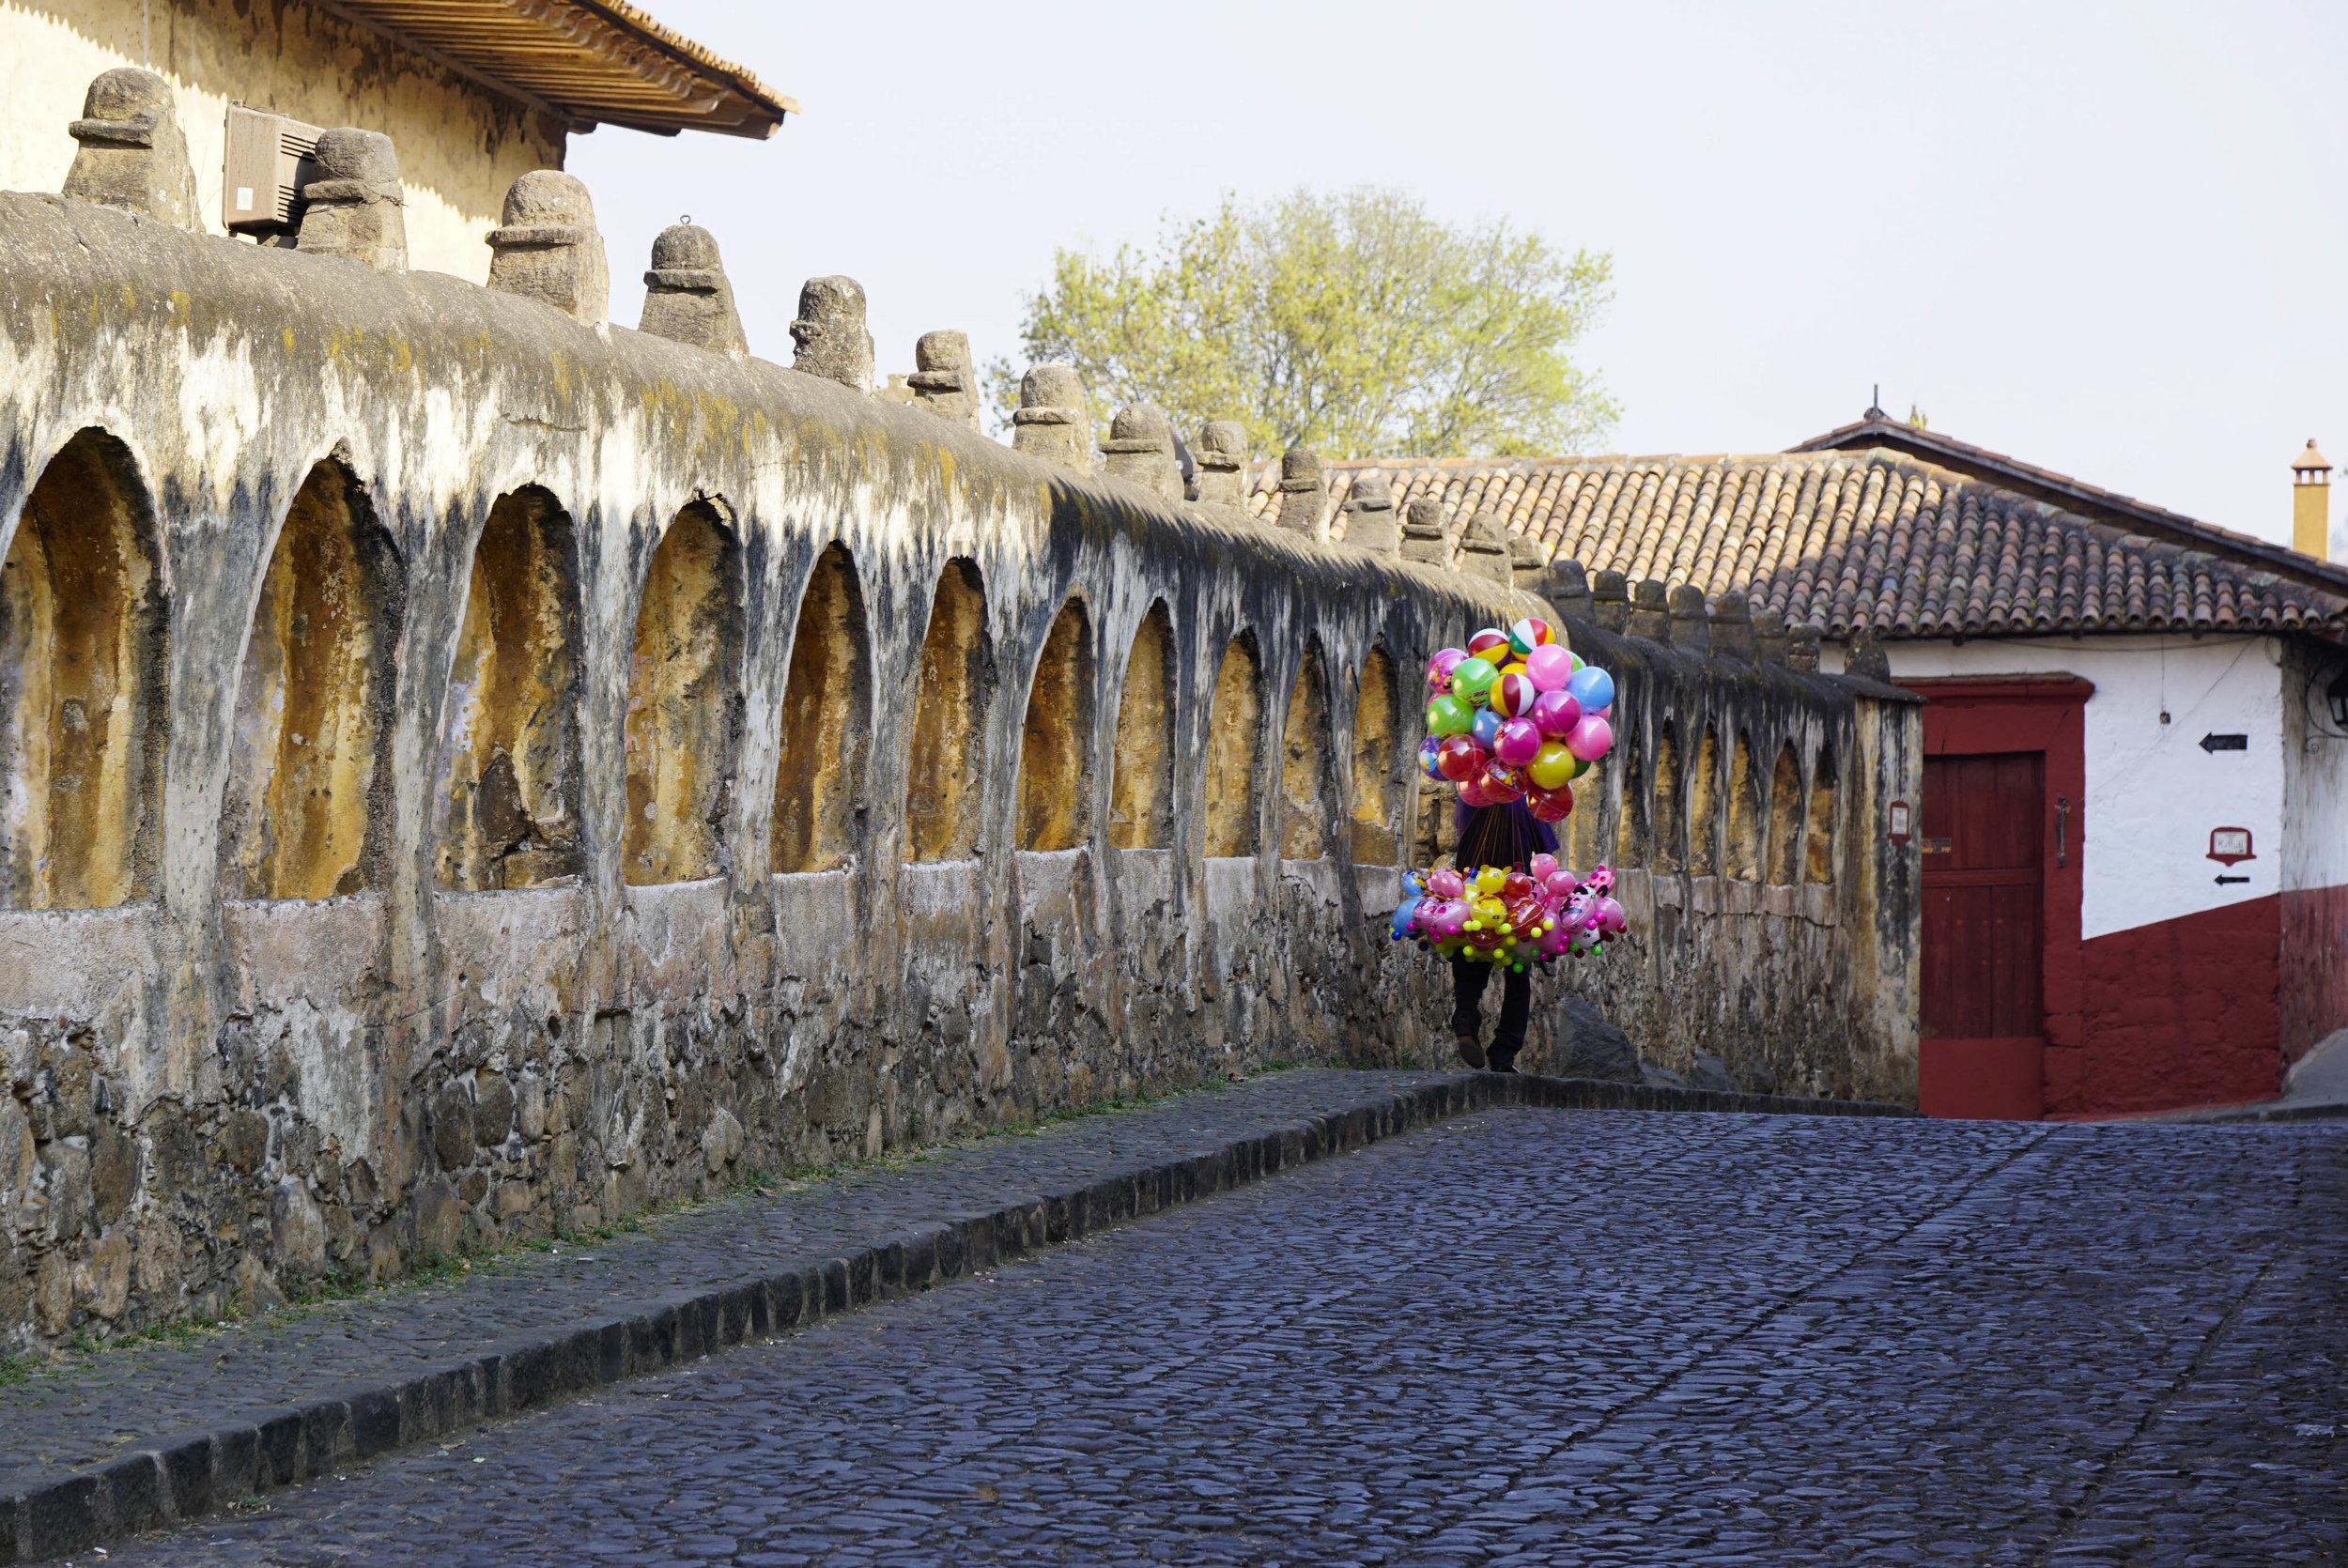 Balloon man_DSC7606.jpg